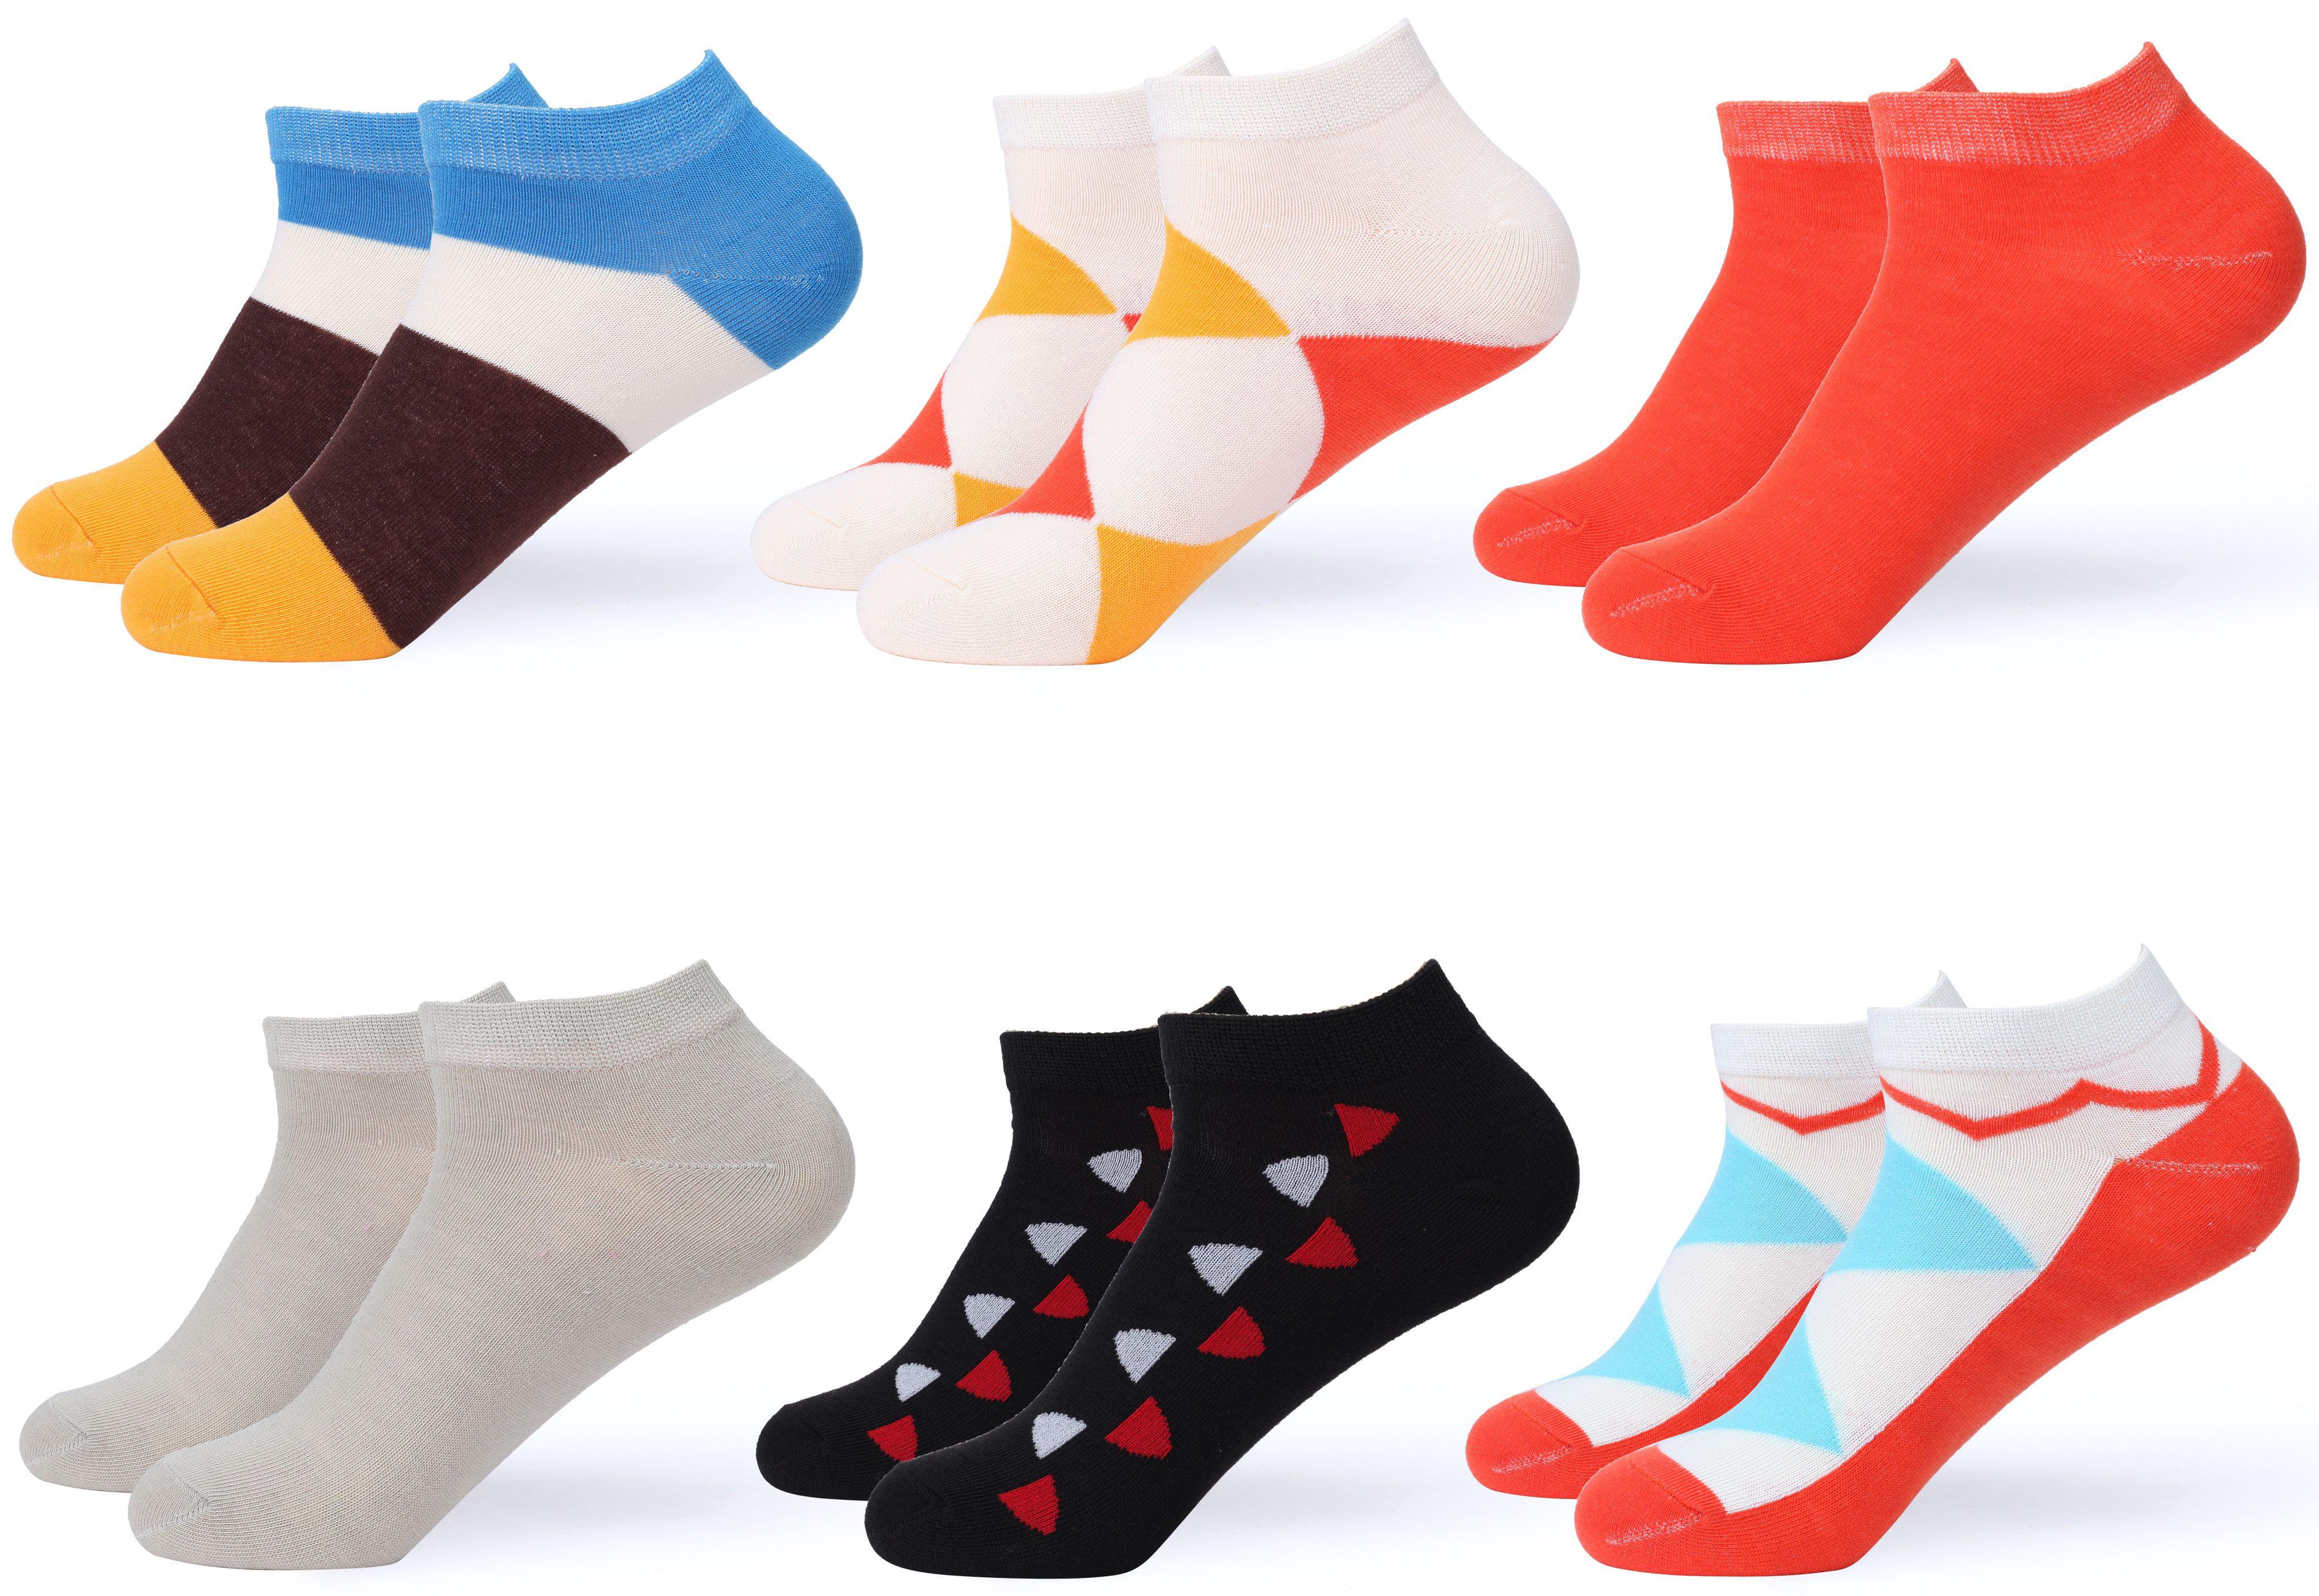 6 Pairs Women Girls Fashion Cotton School Casual Low Cut Socks Size 9-11 cat p